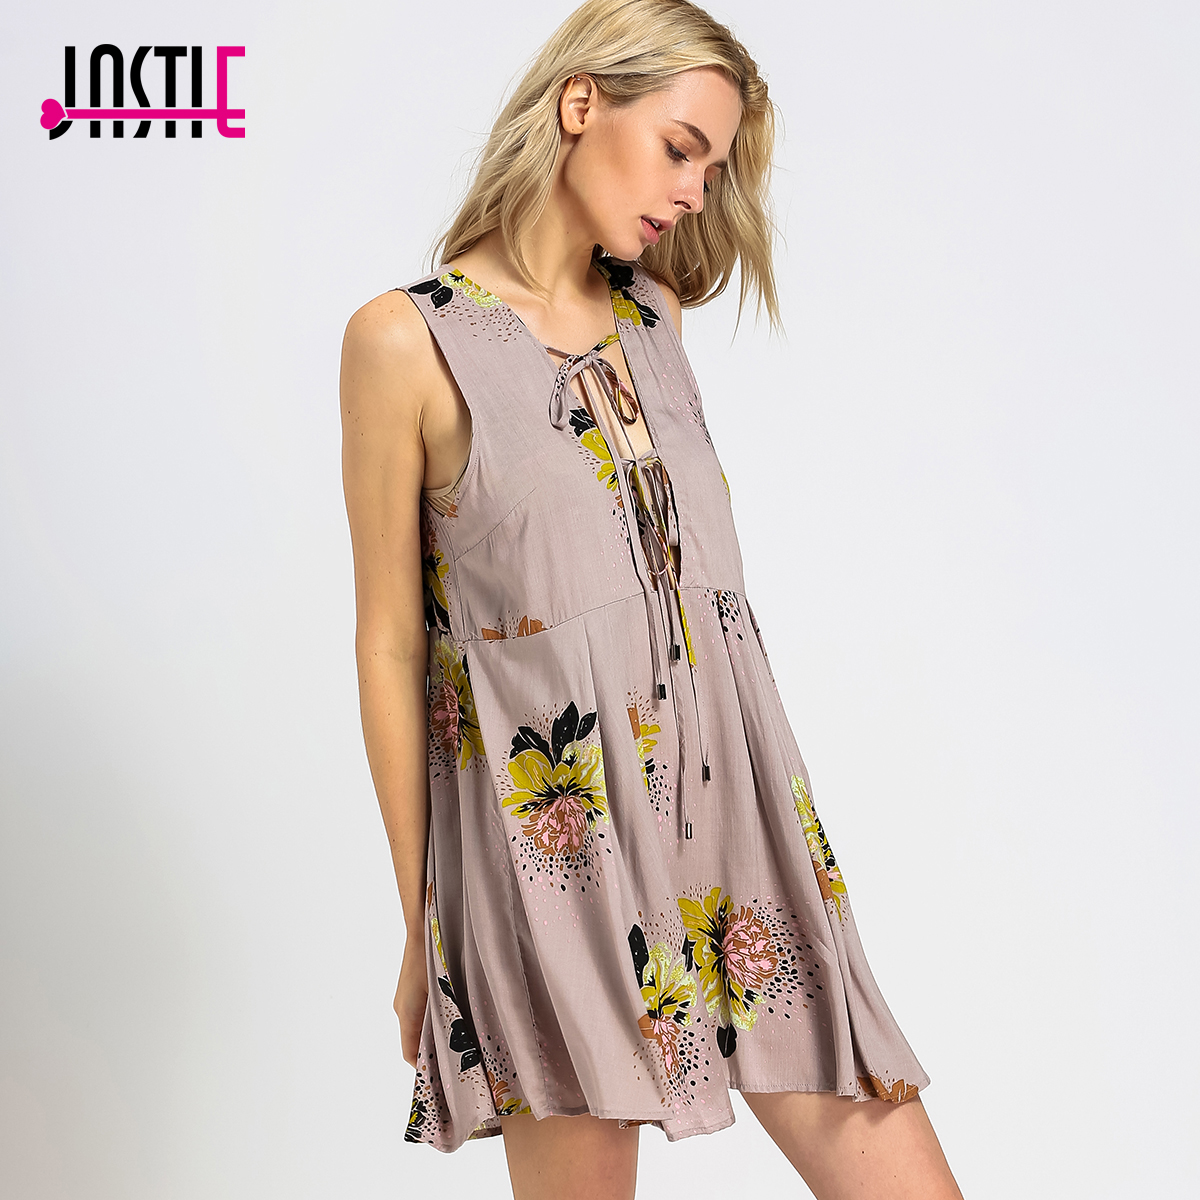 cdff53e55273 Jastie Loveliest Day Tunic Mini Dress Flowy Deep V-Neck Low Open Back Sexy  Women Dresses Printed Sleeveless Boho Vestidos Y-159